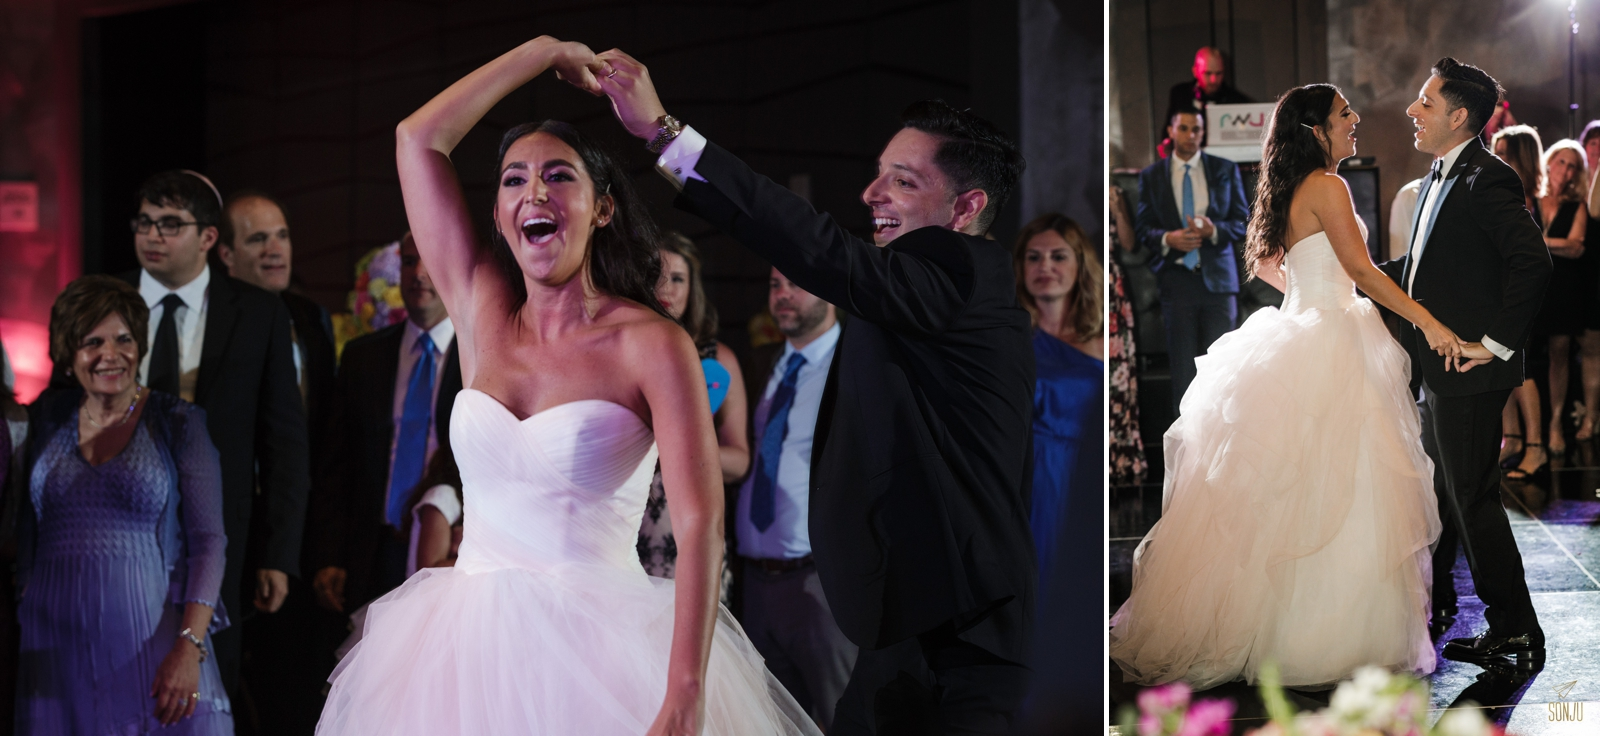 W-Fort-Lauderdale-Wedding-Photographer-South-Florida-Weddings-Michelle-Eric-Sonju00031.jpg